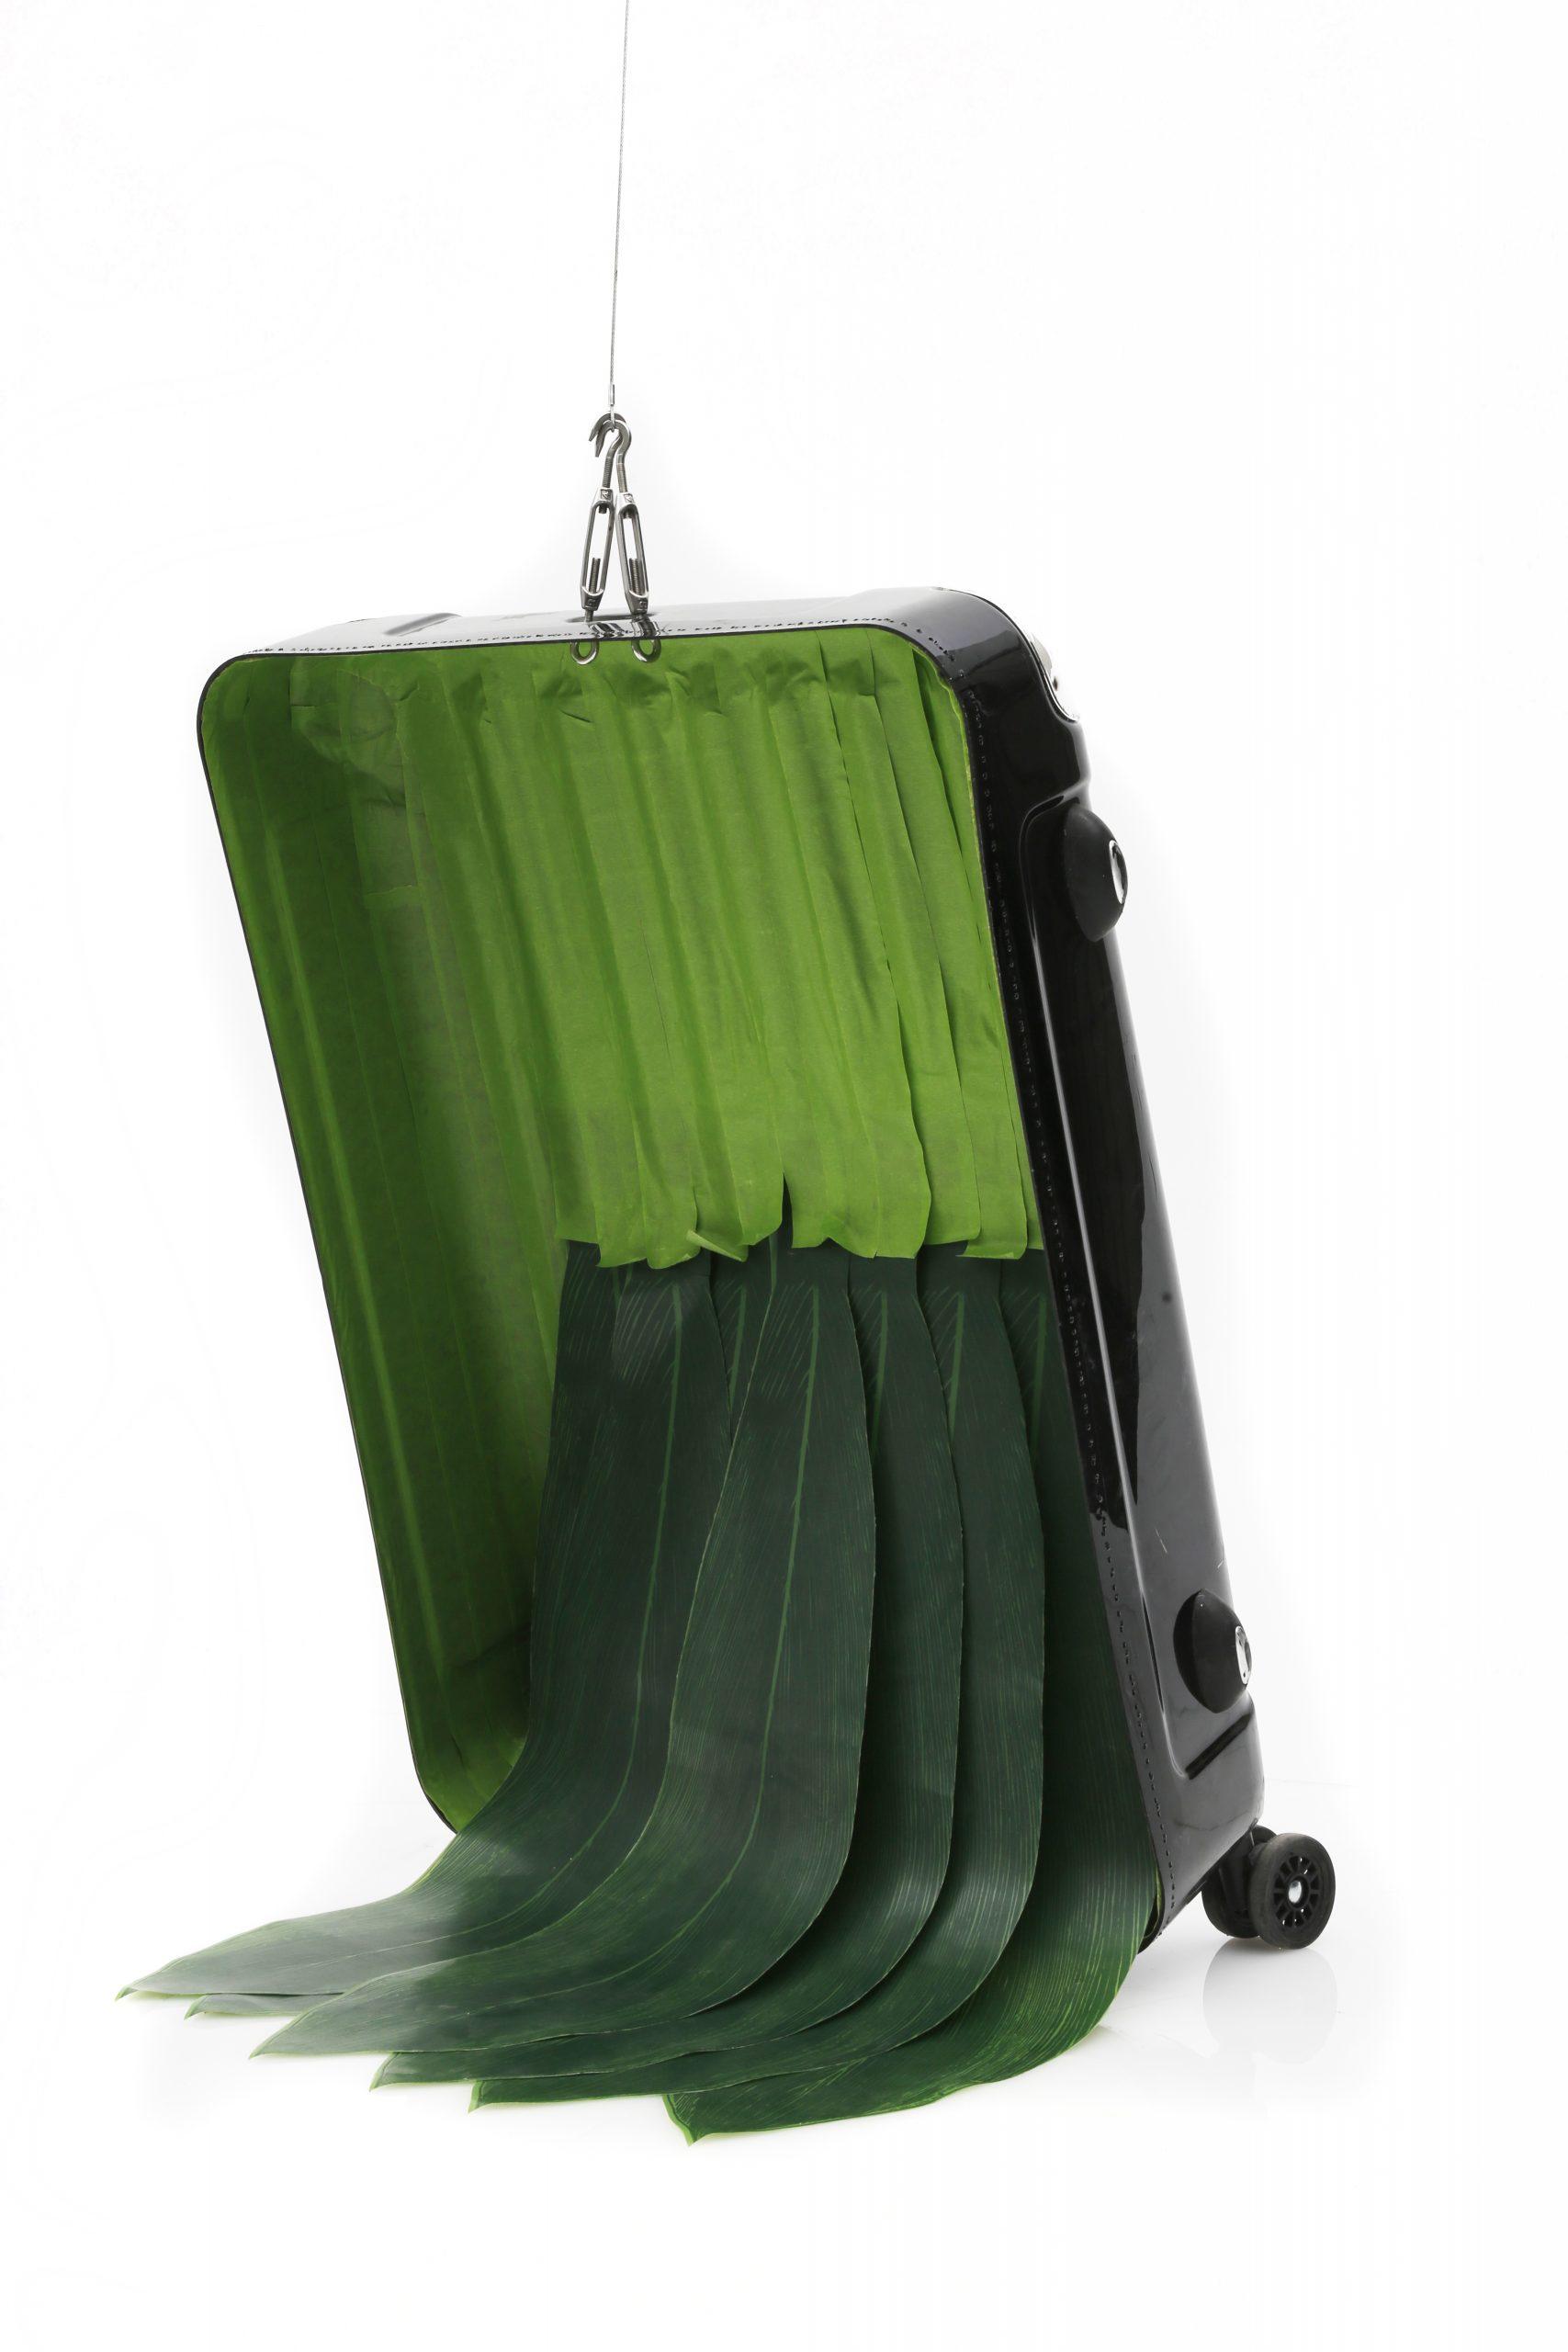 Baggage, 2017, Frog tape, plastic leaves, suitcase